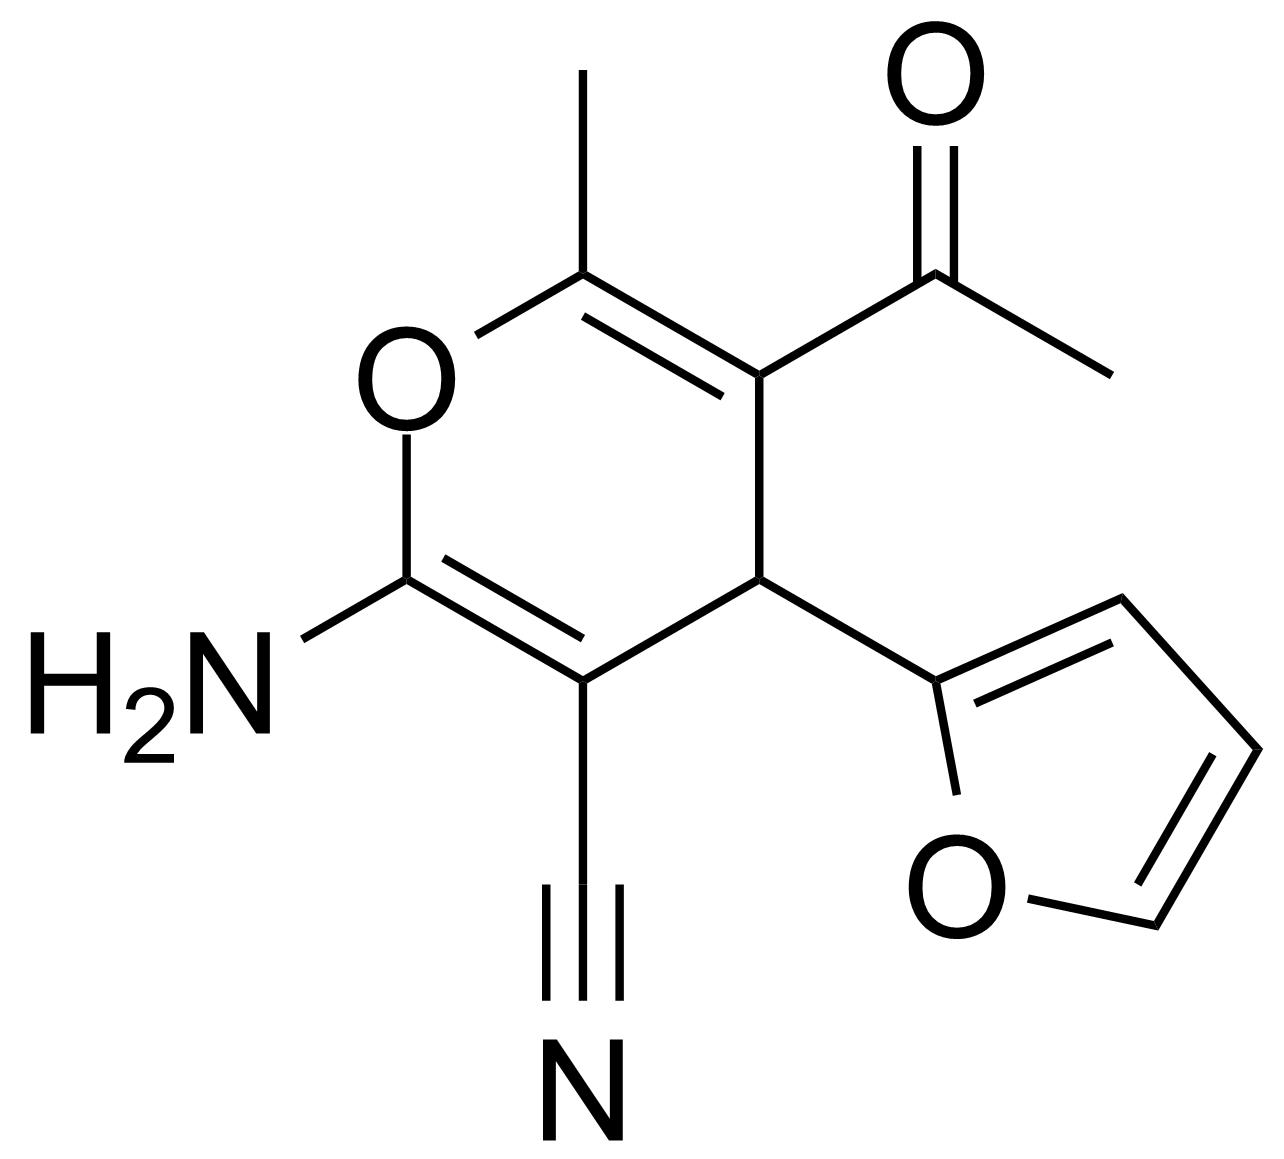 Structure of 5-Acetyl-2-amino-4-(2-furanyl)-6-methyl-4H-pyran-3-carbonitrile